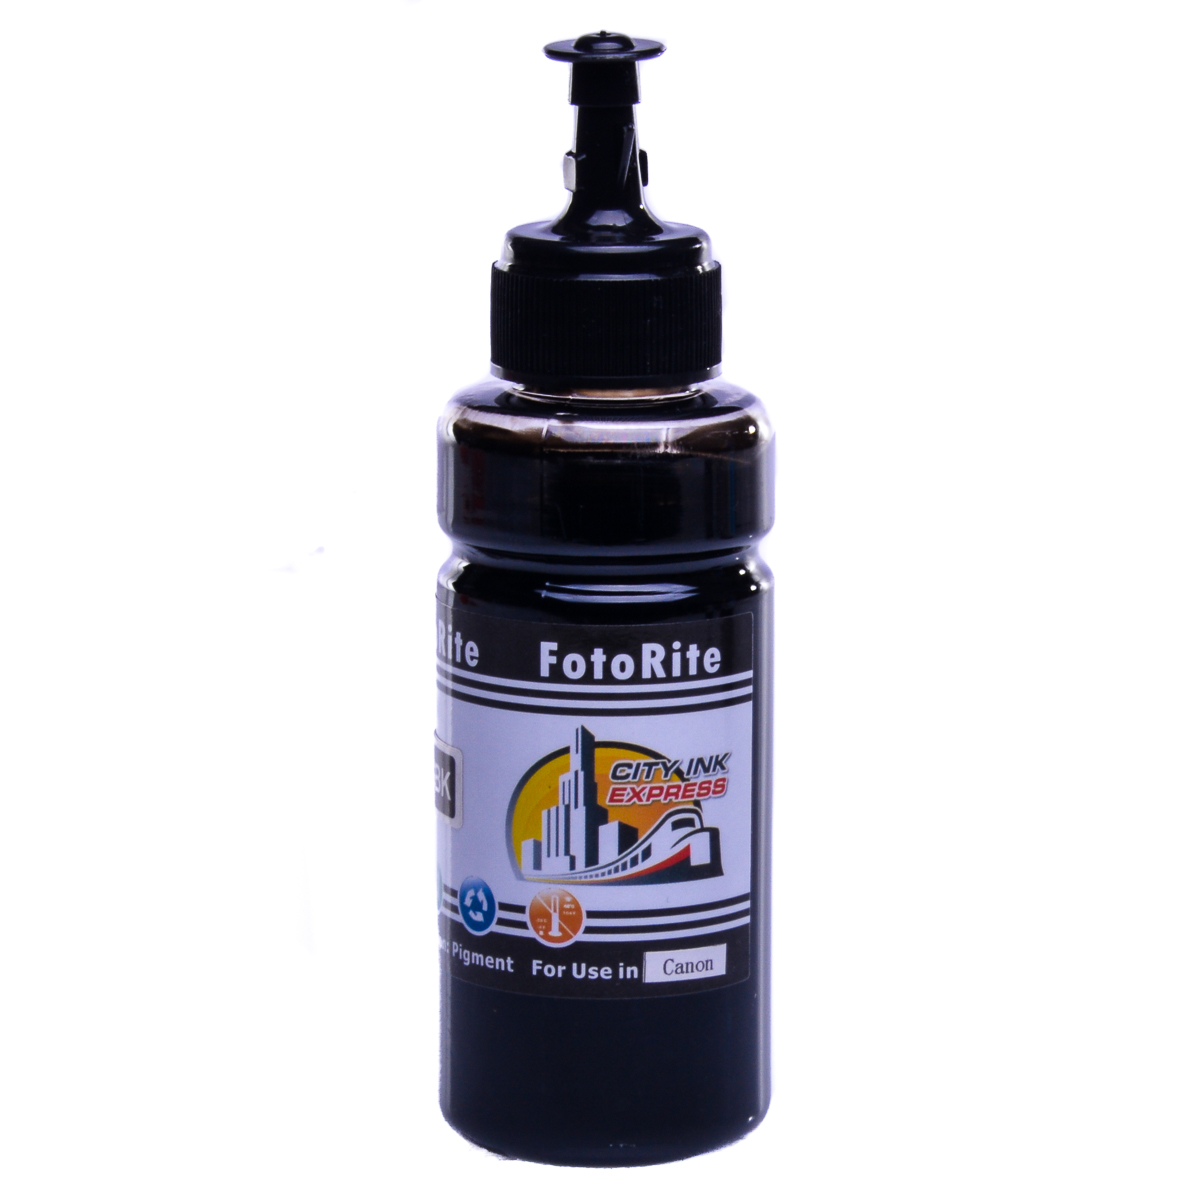 Cheap Pigment Black pigment ink replaces Canon Pixma IX6250 - PGI-525BK